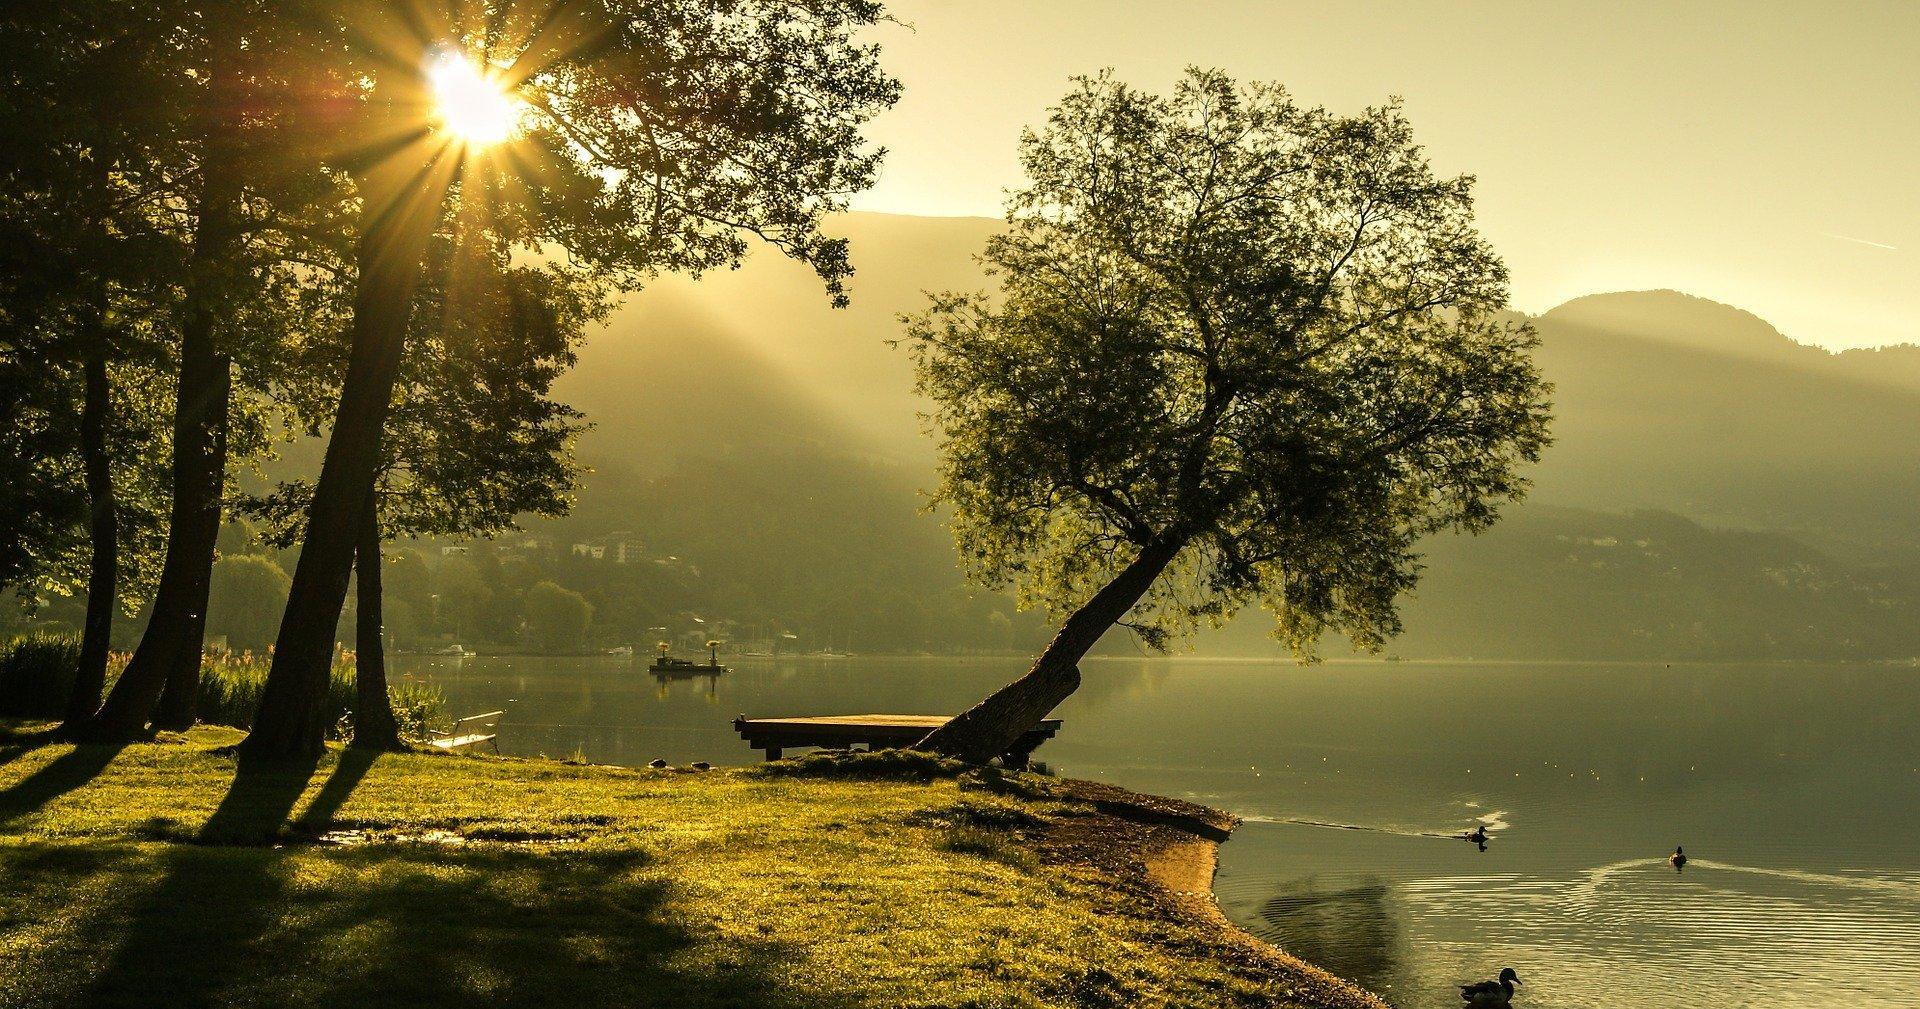 Sonnenaufgang am See © pixabay